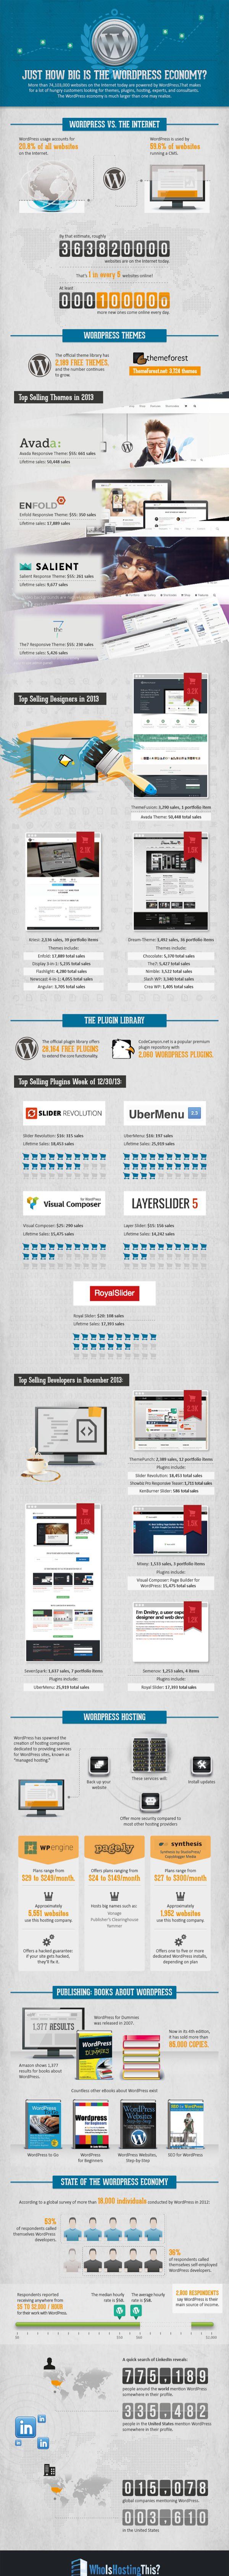 InfoGraphic_Wordpress